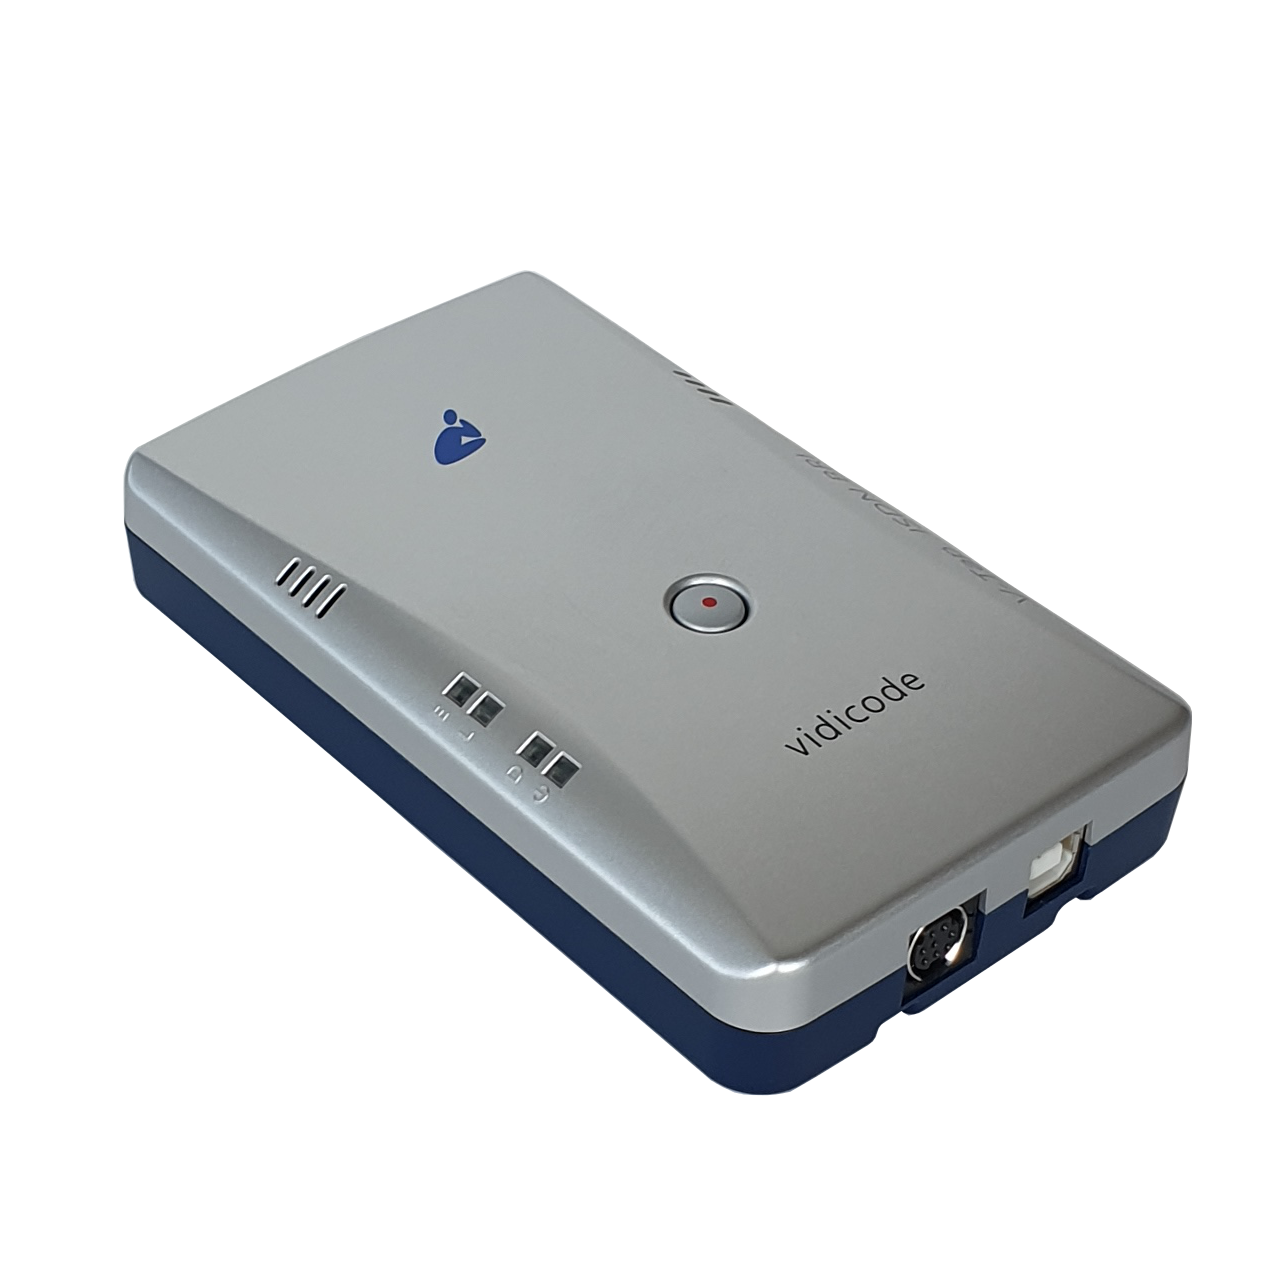 V-Tap ISDN BRI + 2 PC recording licenses – Call Recorder Shop